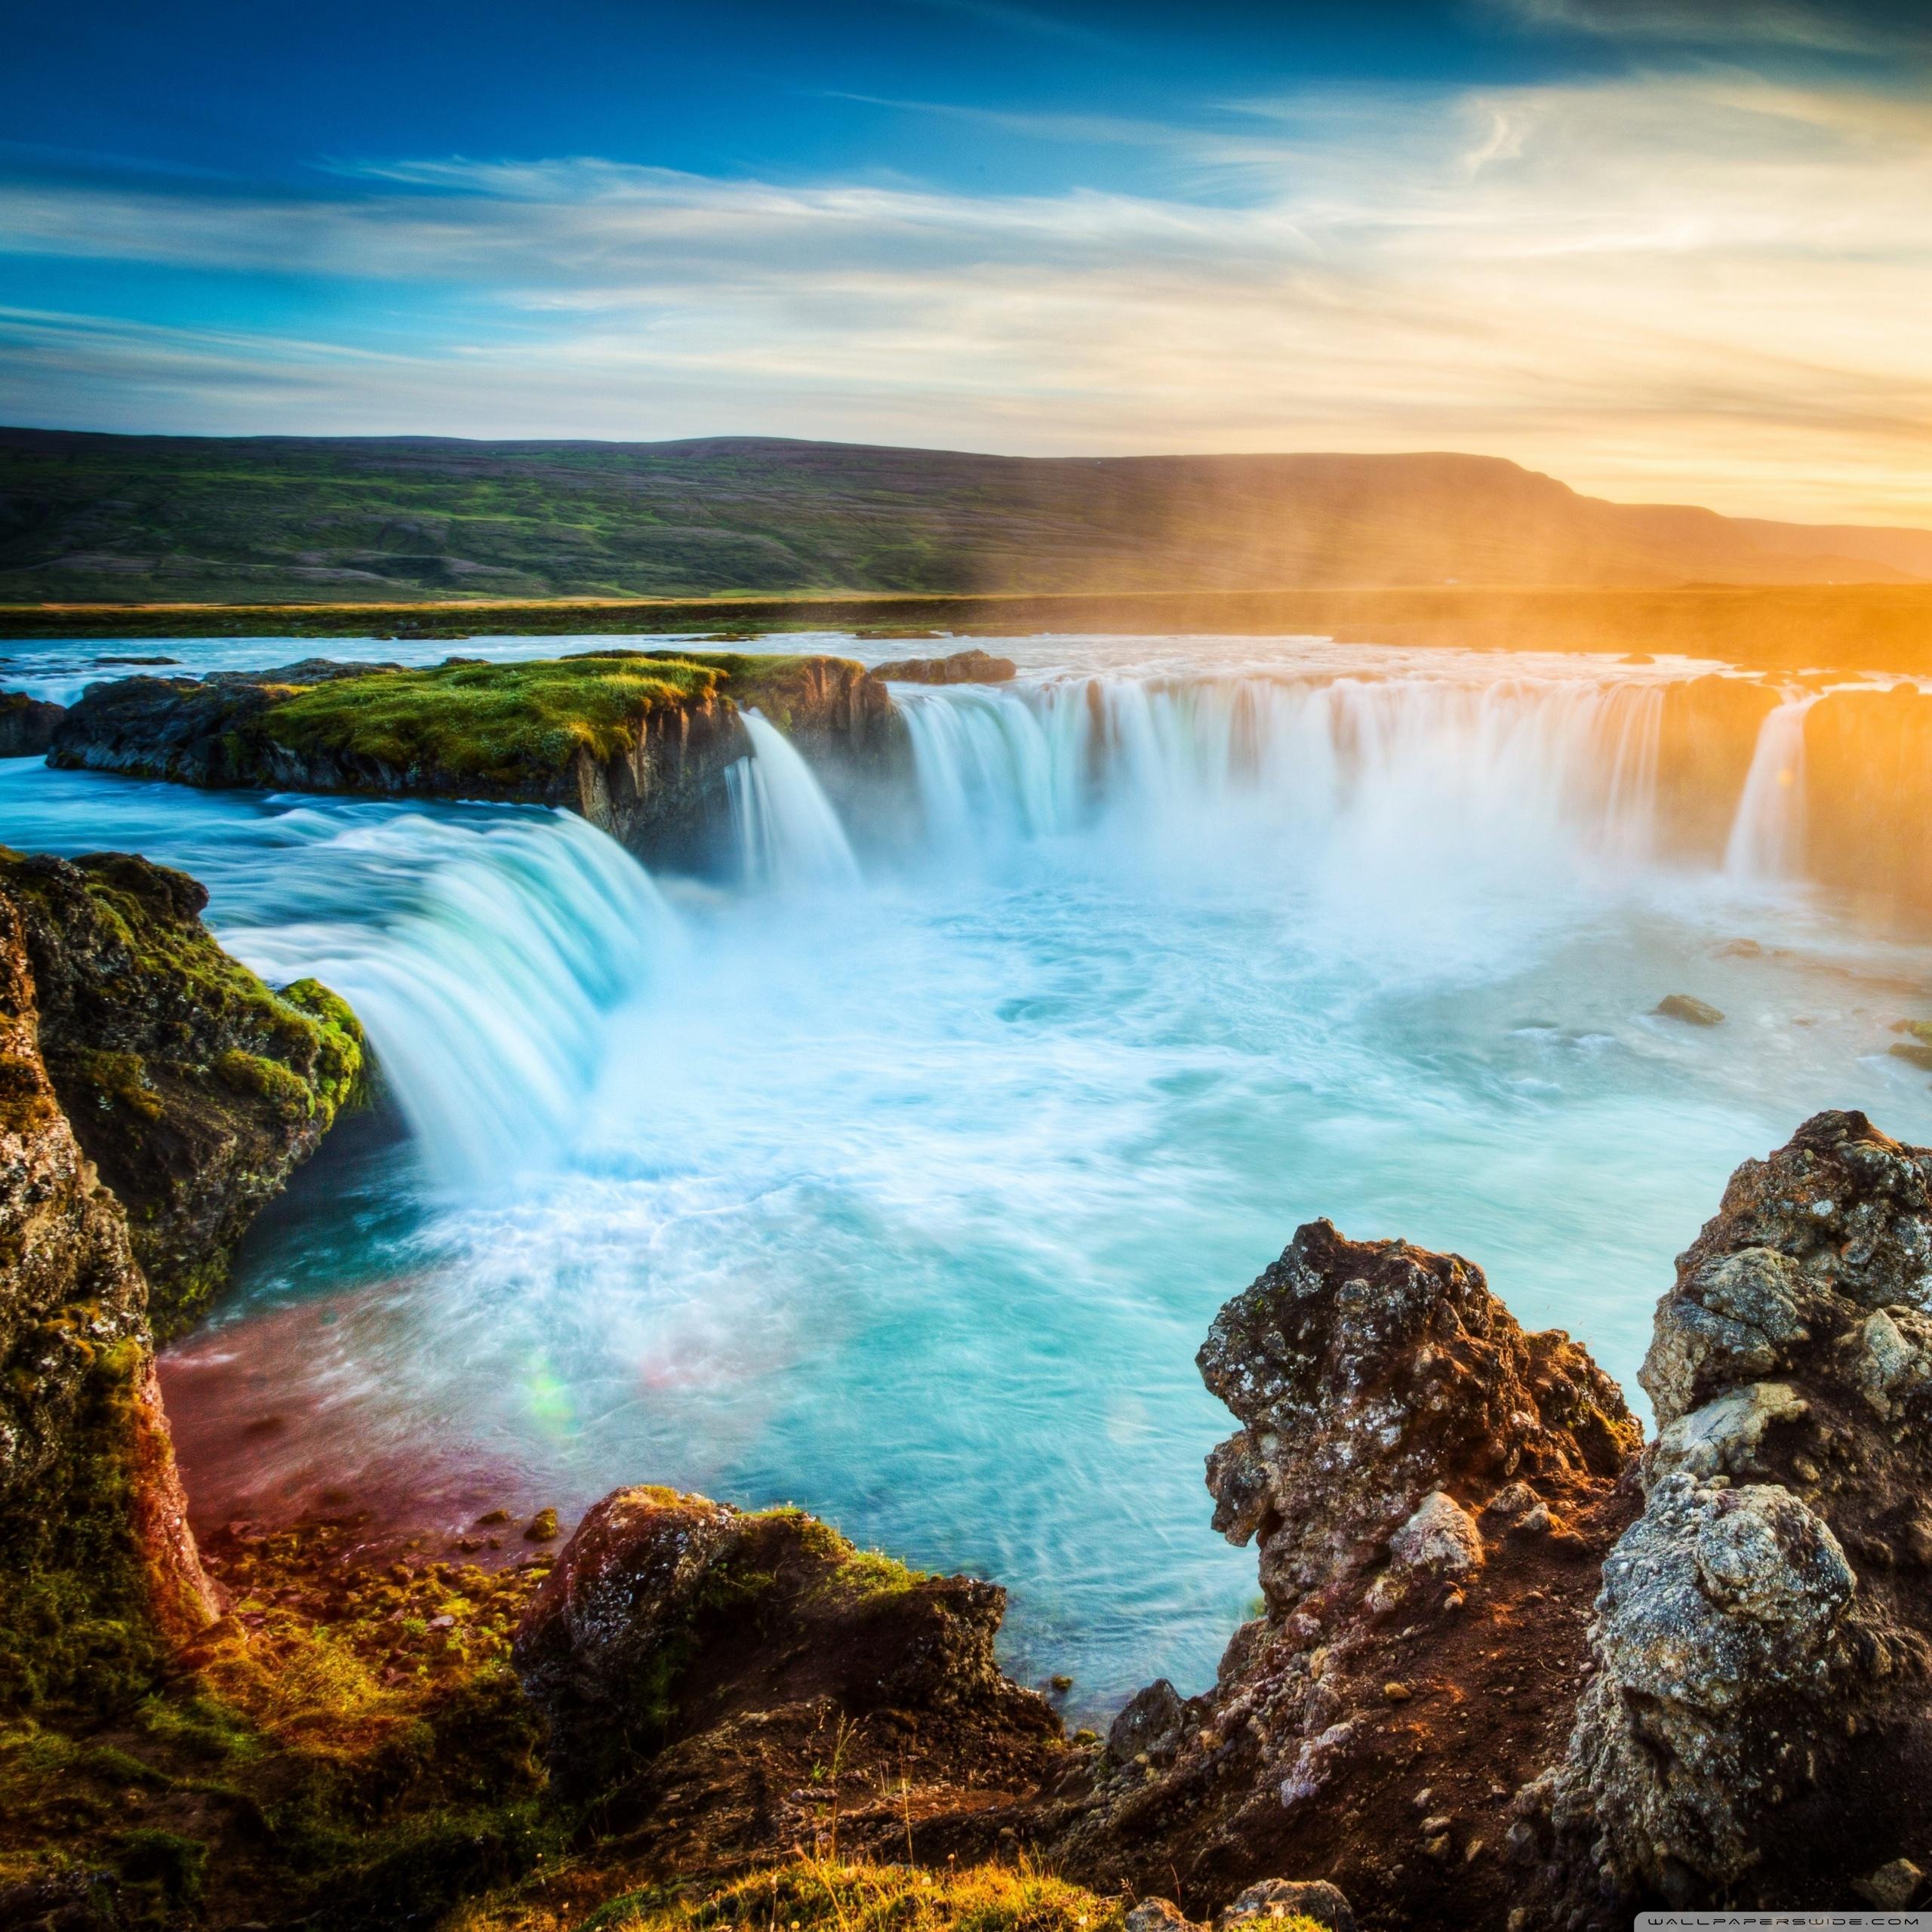 Niagara Falls Wallpaper For Desktop Godafoss Waterfall Iceland 4k Hd Desktop Wallpaper For 4k